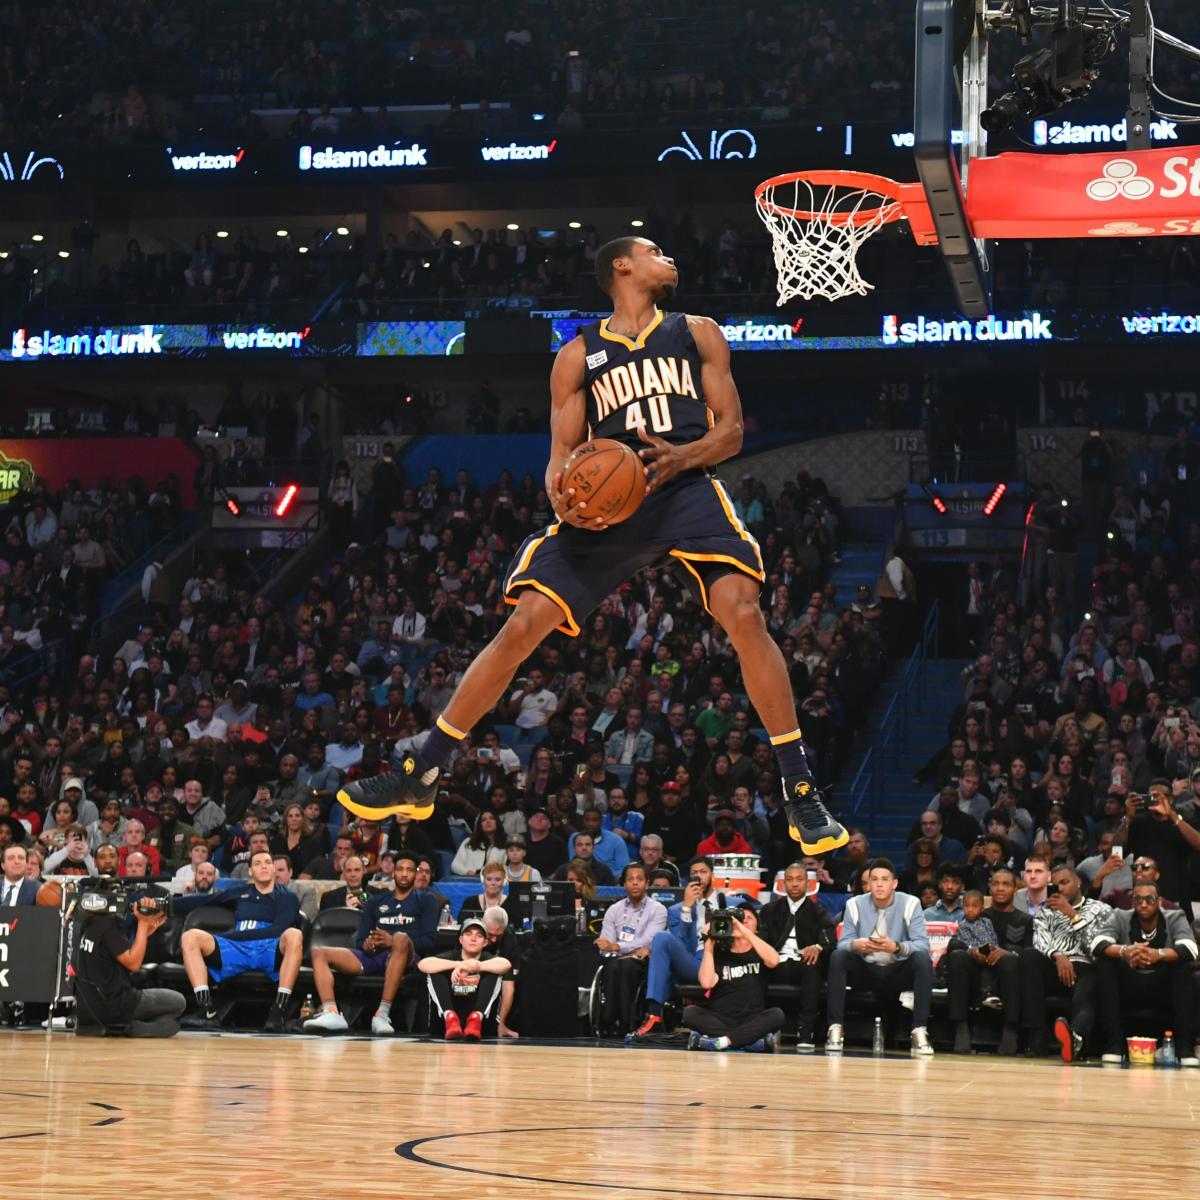 Dunk Contest 2017: Glenn Robinson III Wins 2017 NBA Slam Dunk Contest: Where